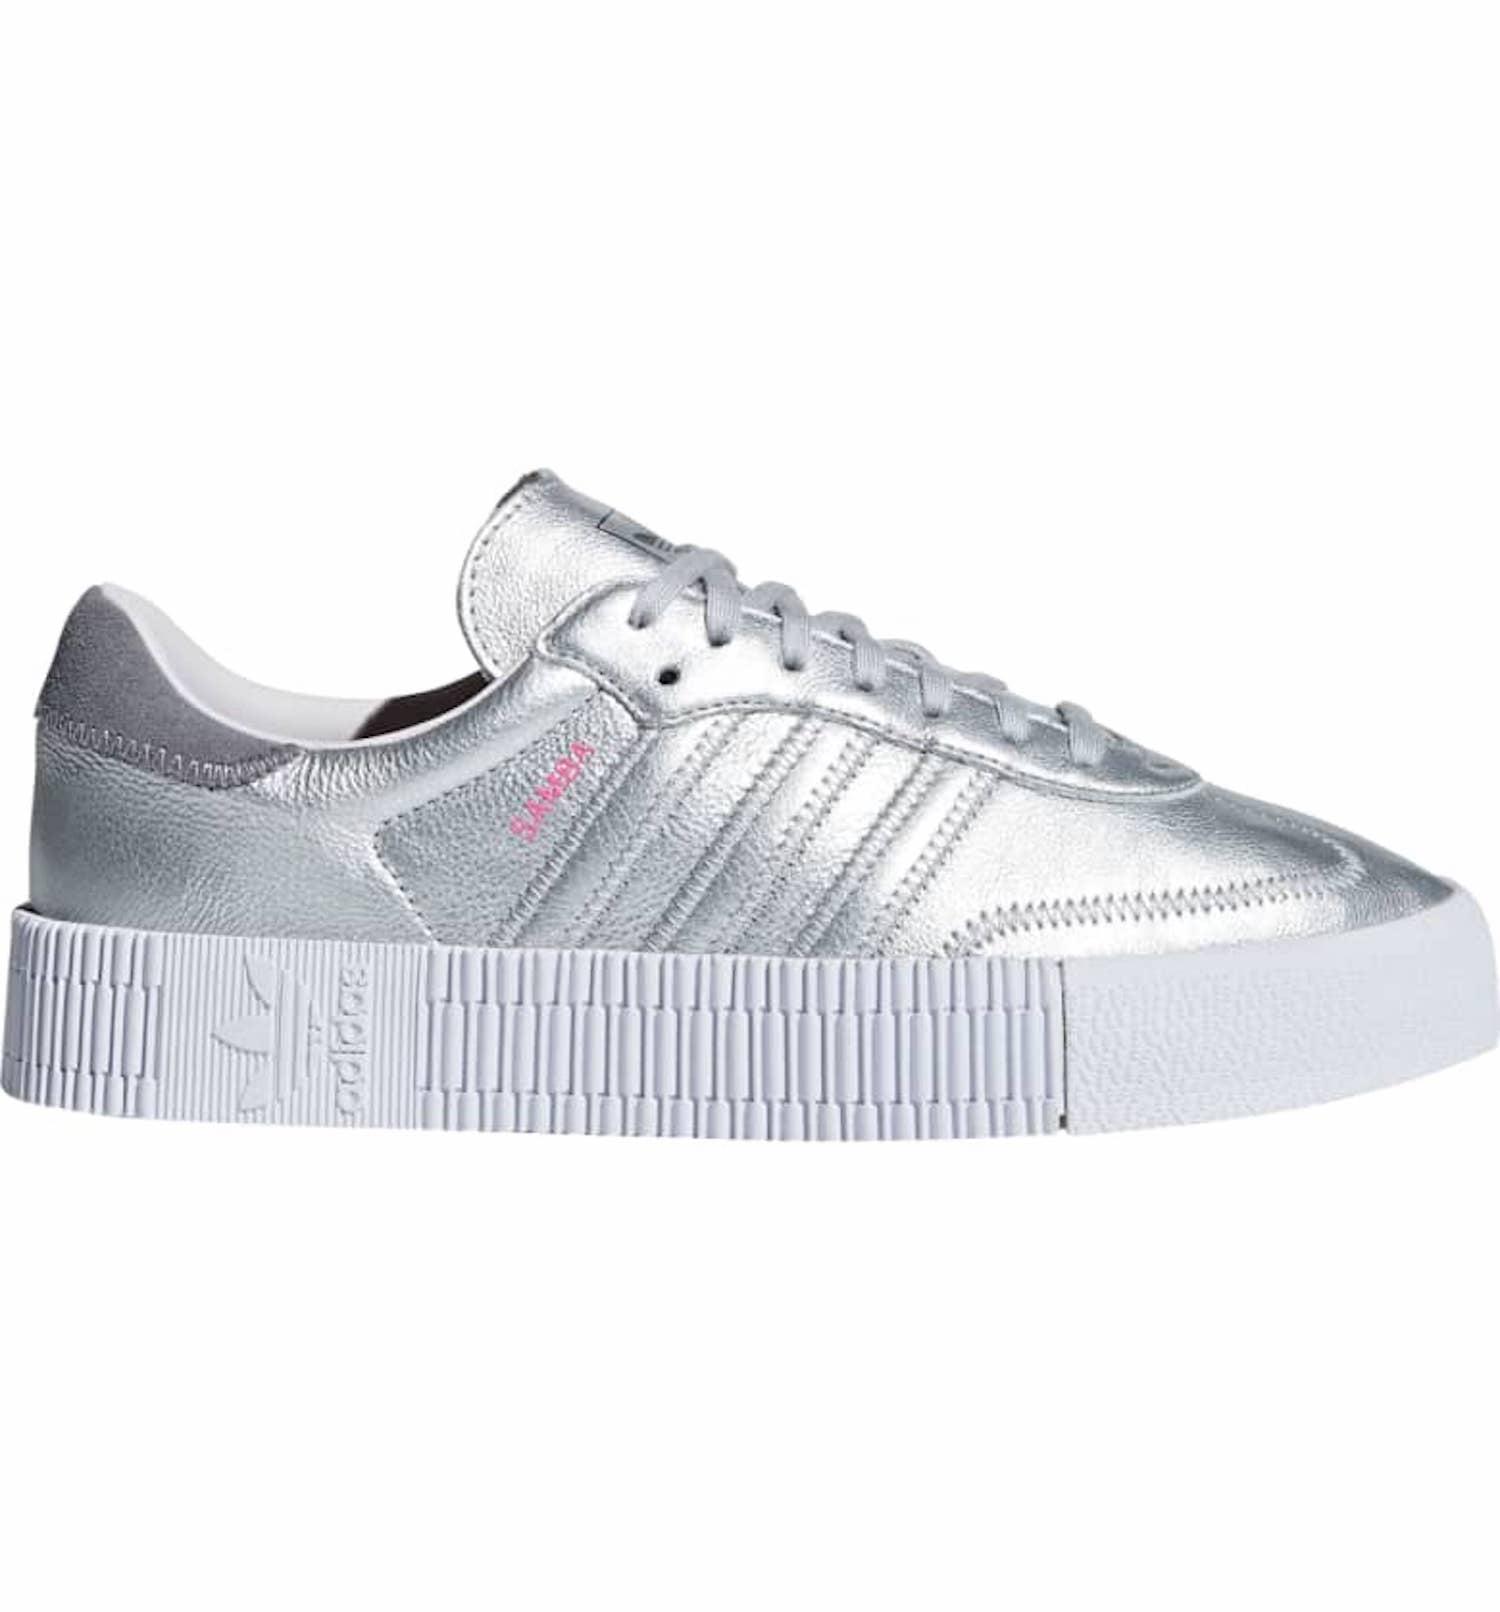 Adidas Silver Samba Sneakers   POPSUGAR